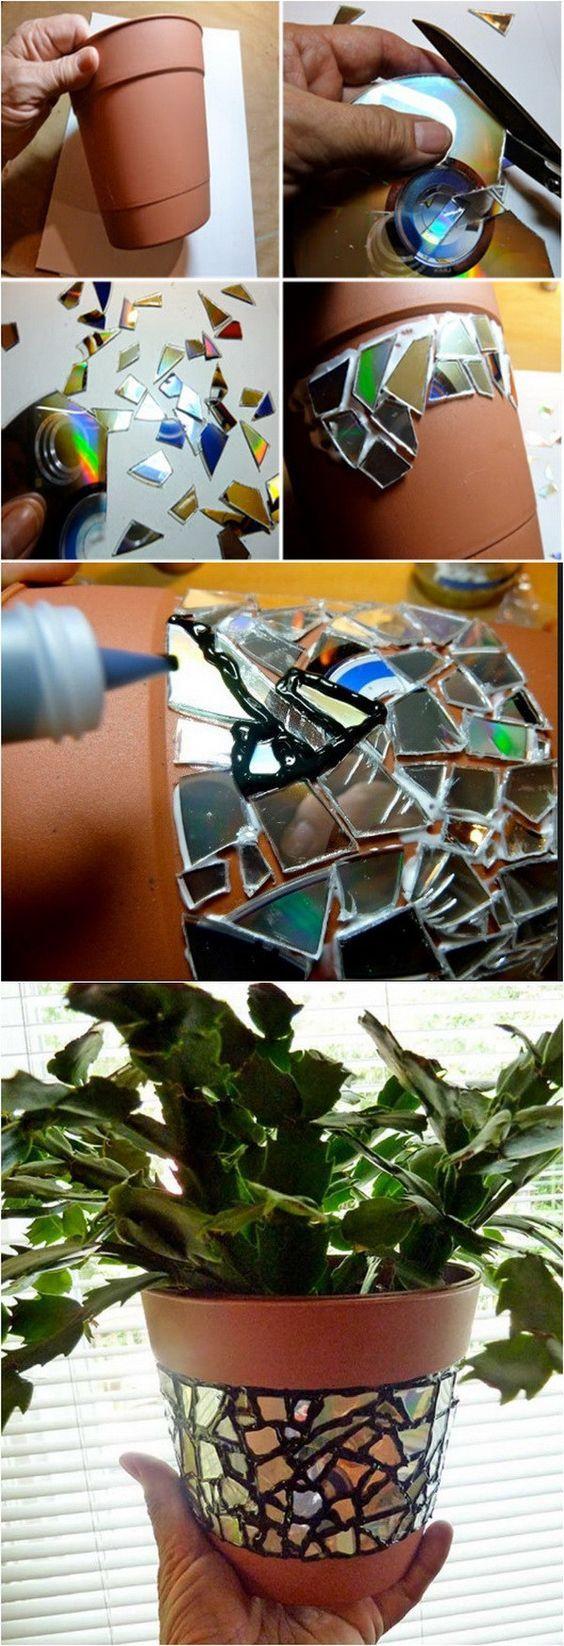 Recycled CD Mosaic Flower Pot. Ever got a stock of useless CDs? Don't throw them away! Make a beautiful CD mosaic flower pot instead.